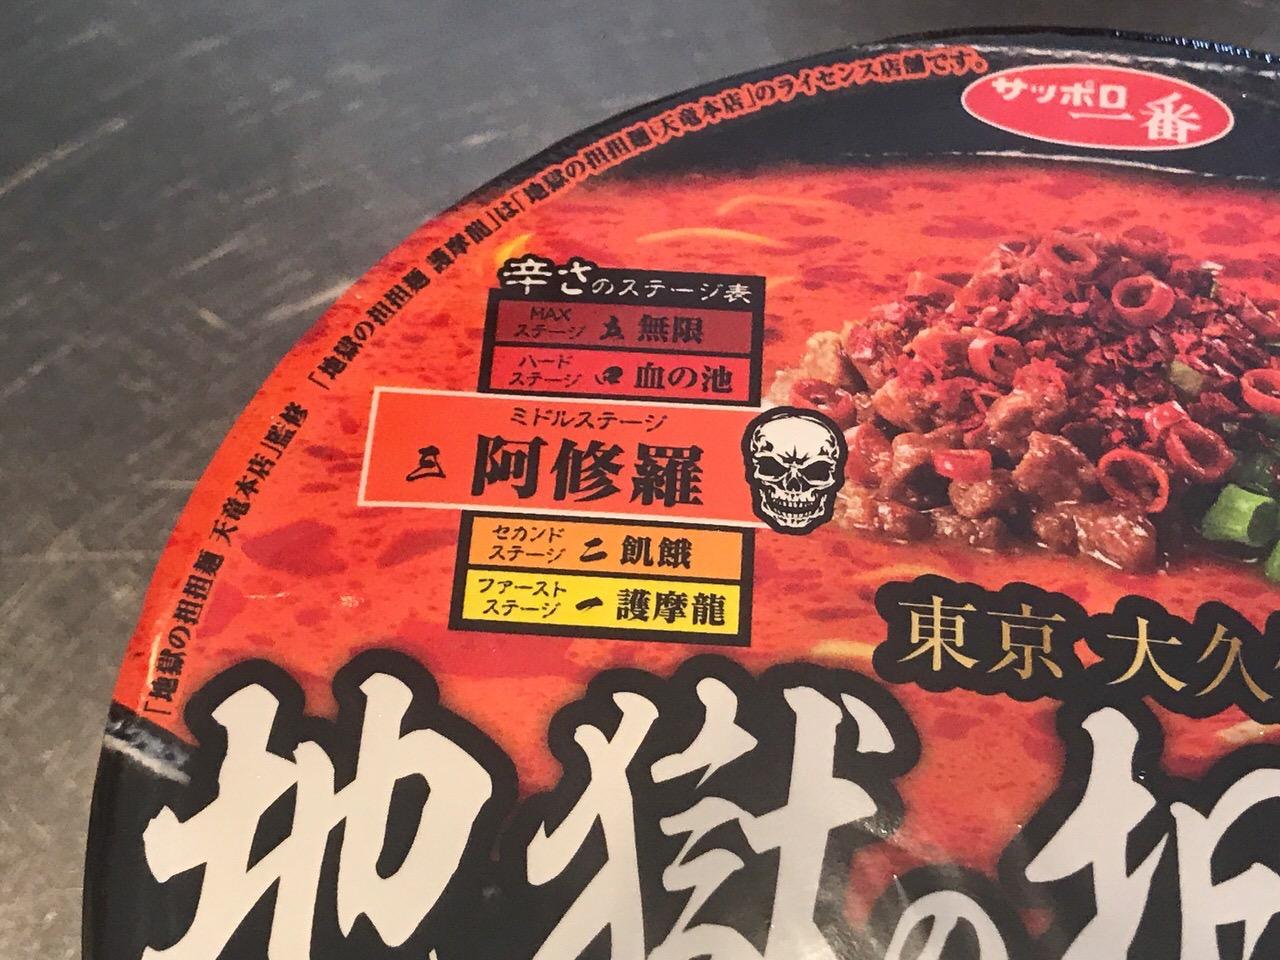 地獄の担担麺 護摩龍